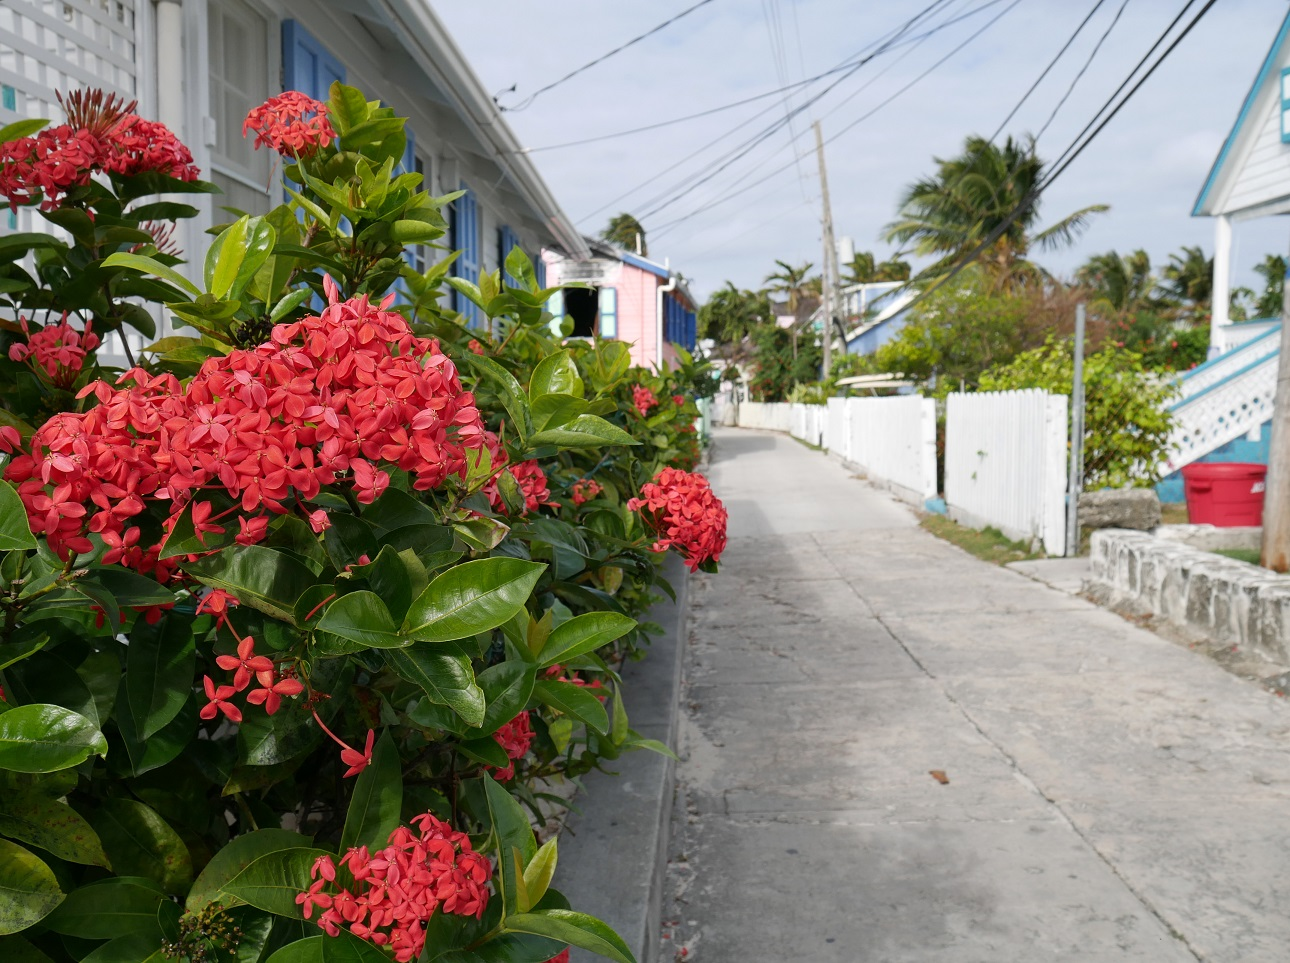 Street scene in Hope Town, Elbow Cay, Bahamas